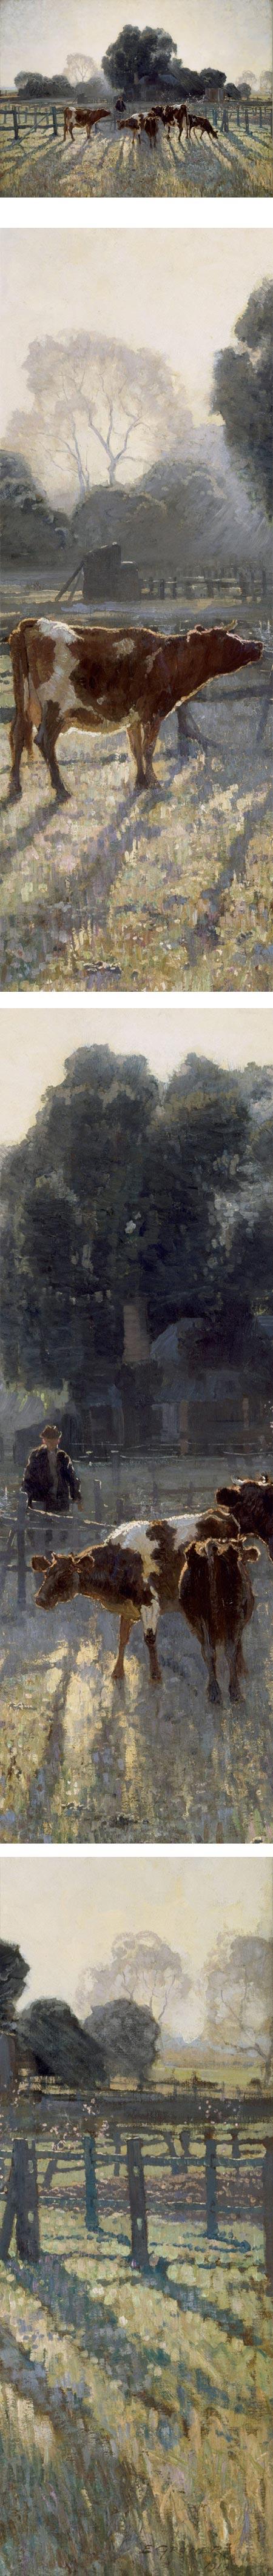 Spring Fros, Elioth Gruner